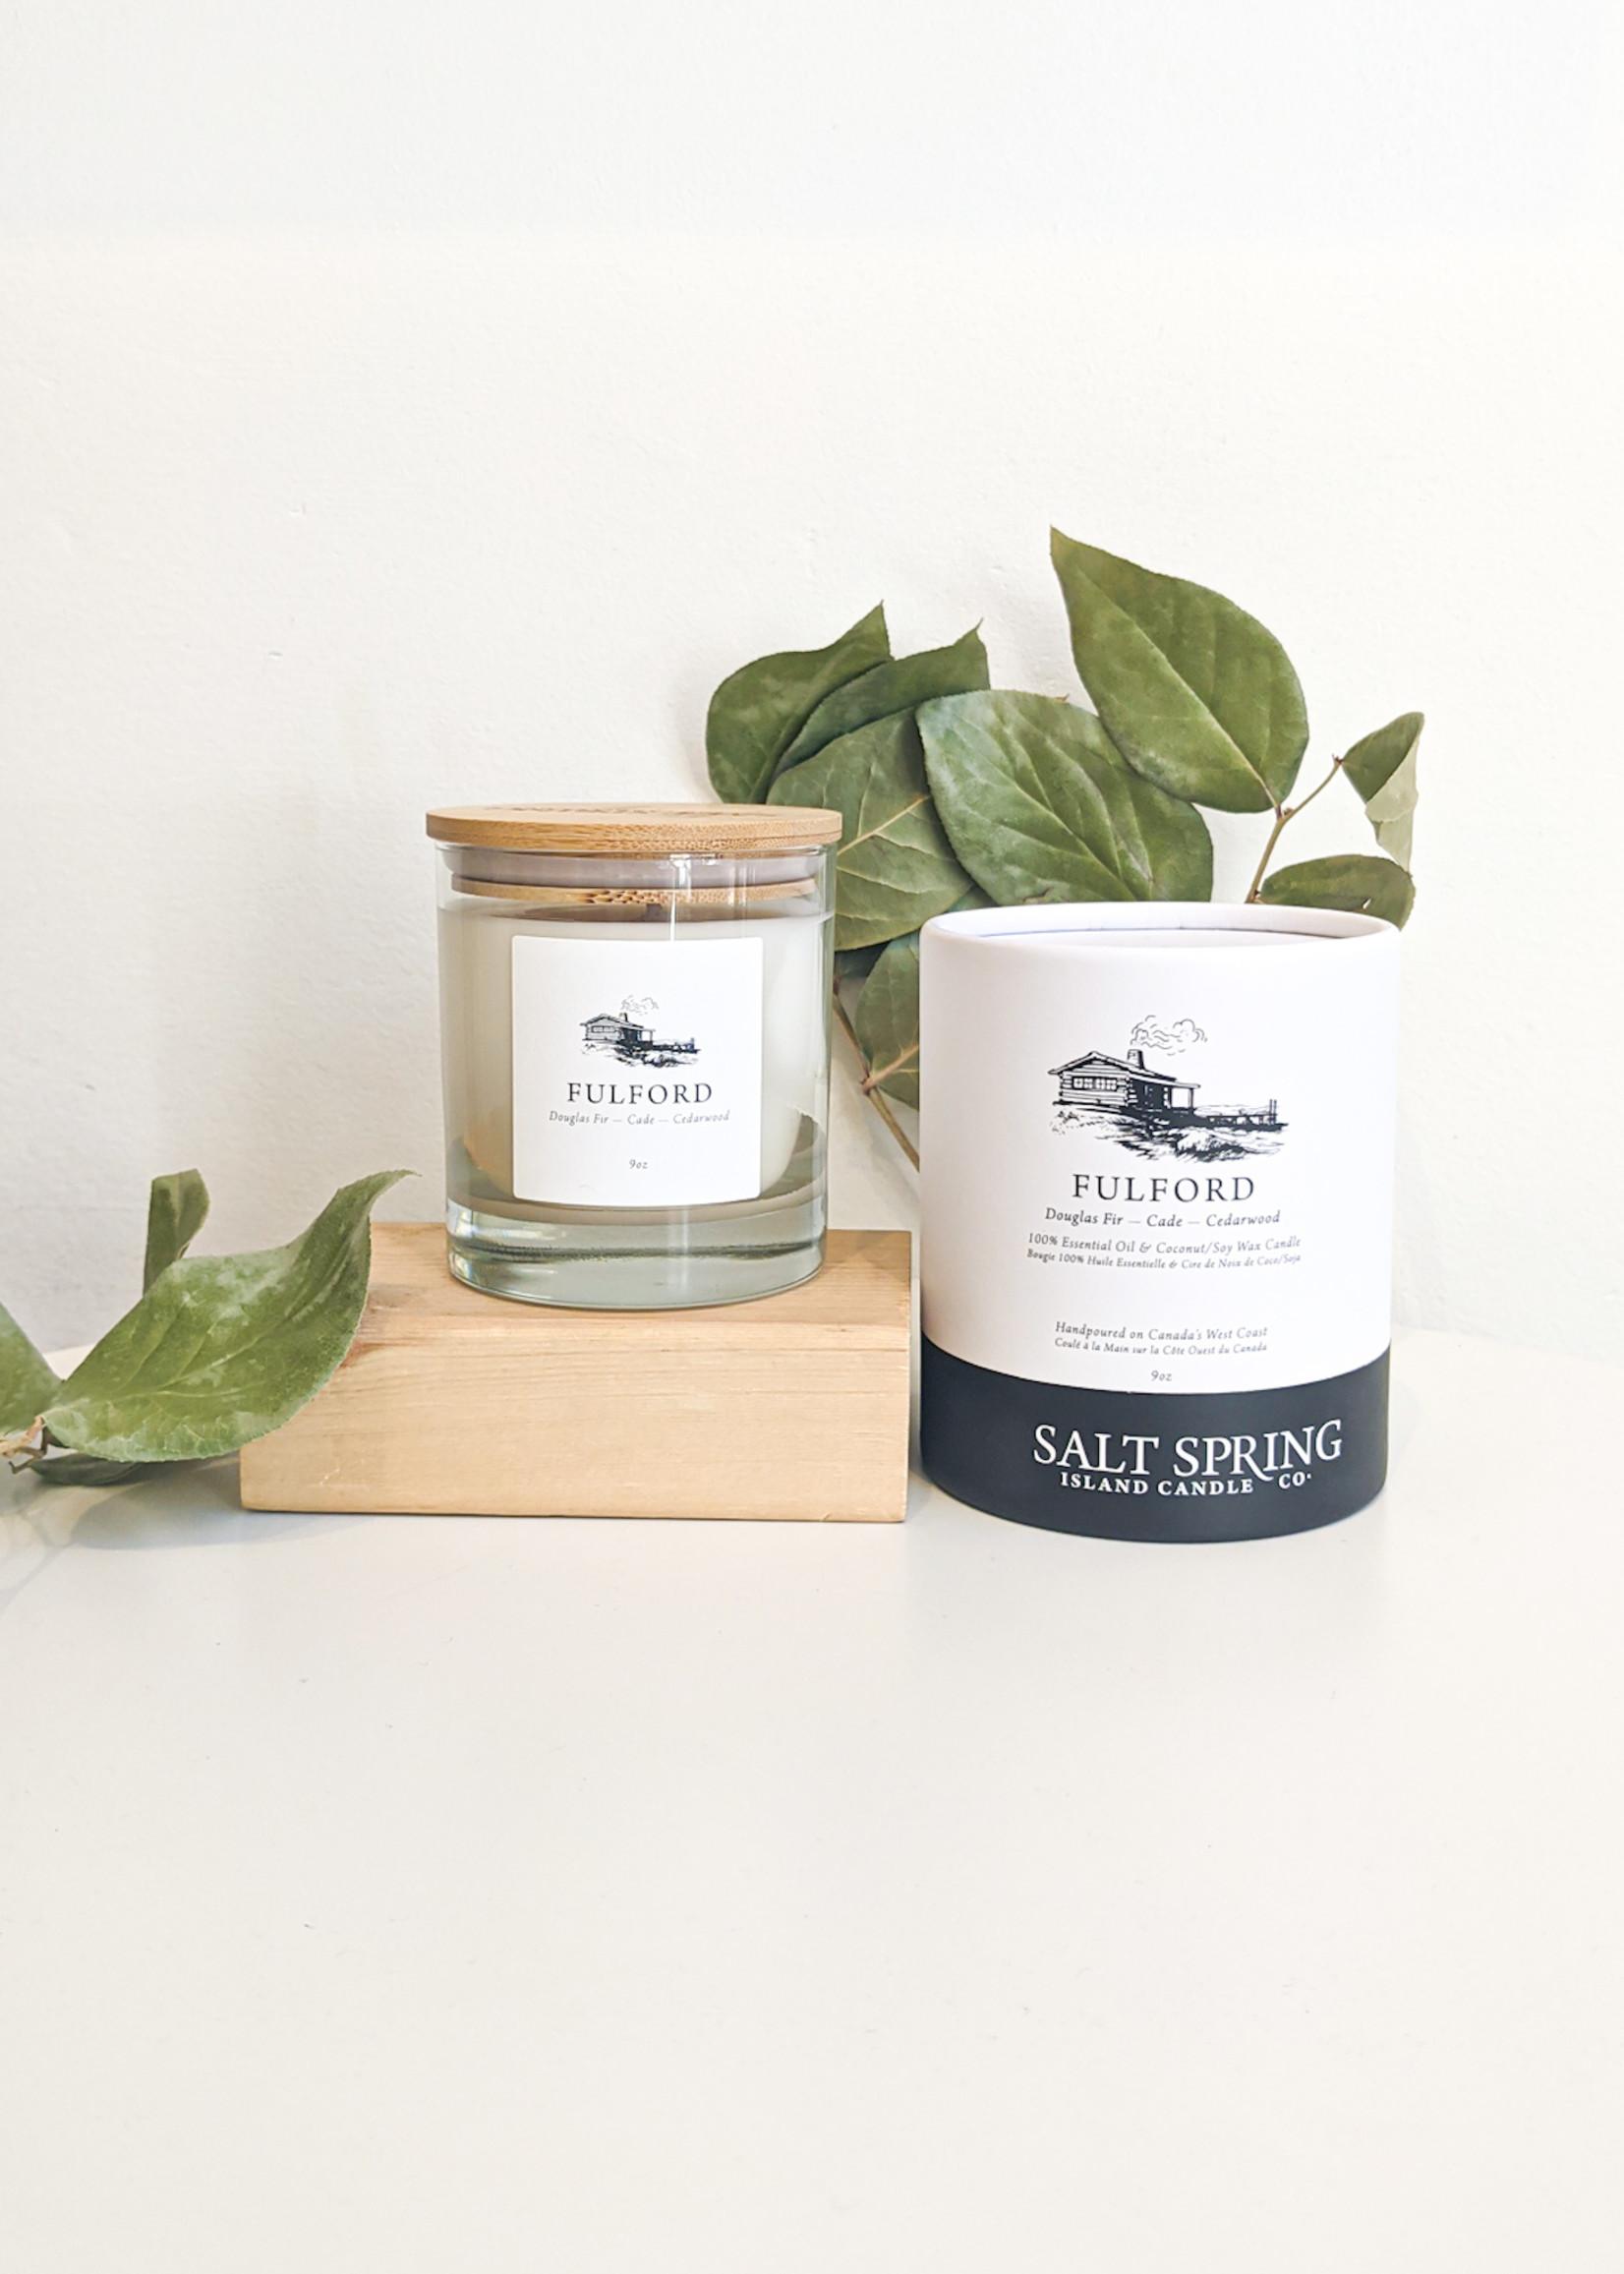 Salt Spring Island Candle Co. - Fulford 9 oz  Candle